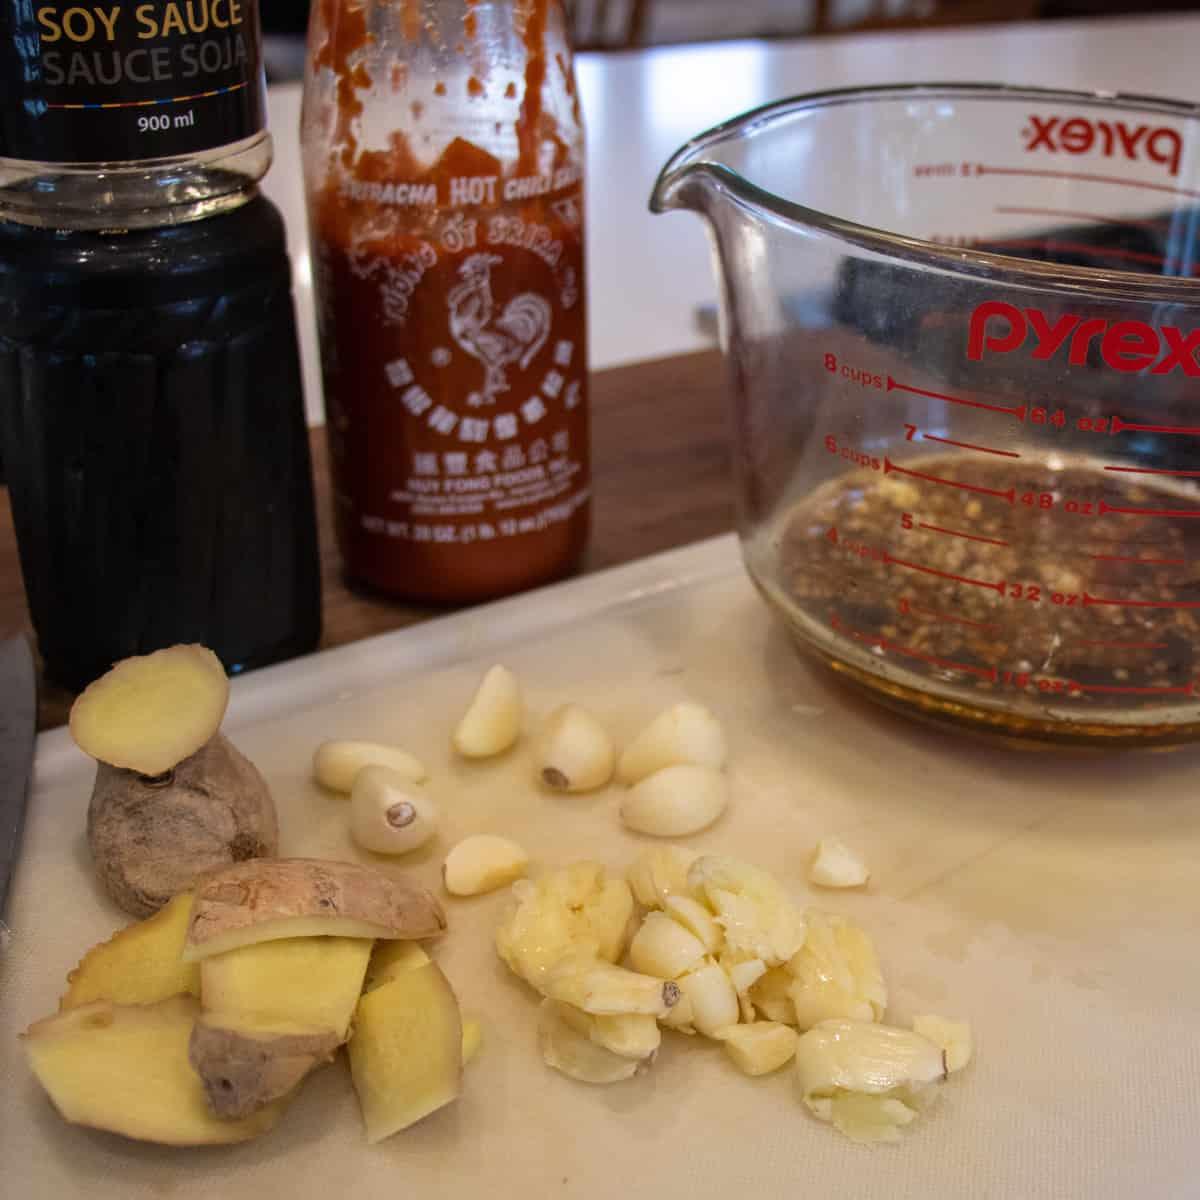 Fresh ginger and garlic on a cutting board